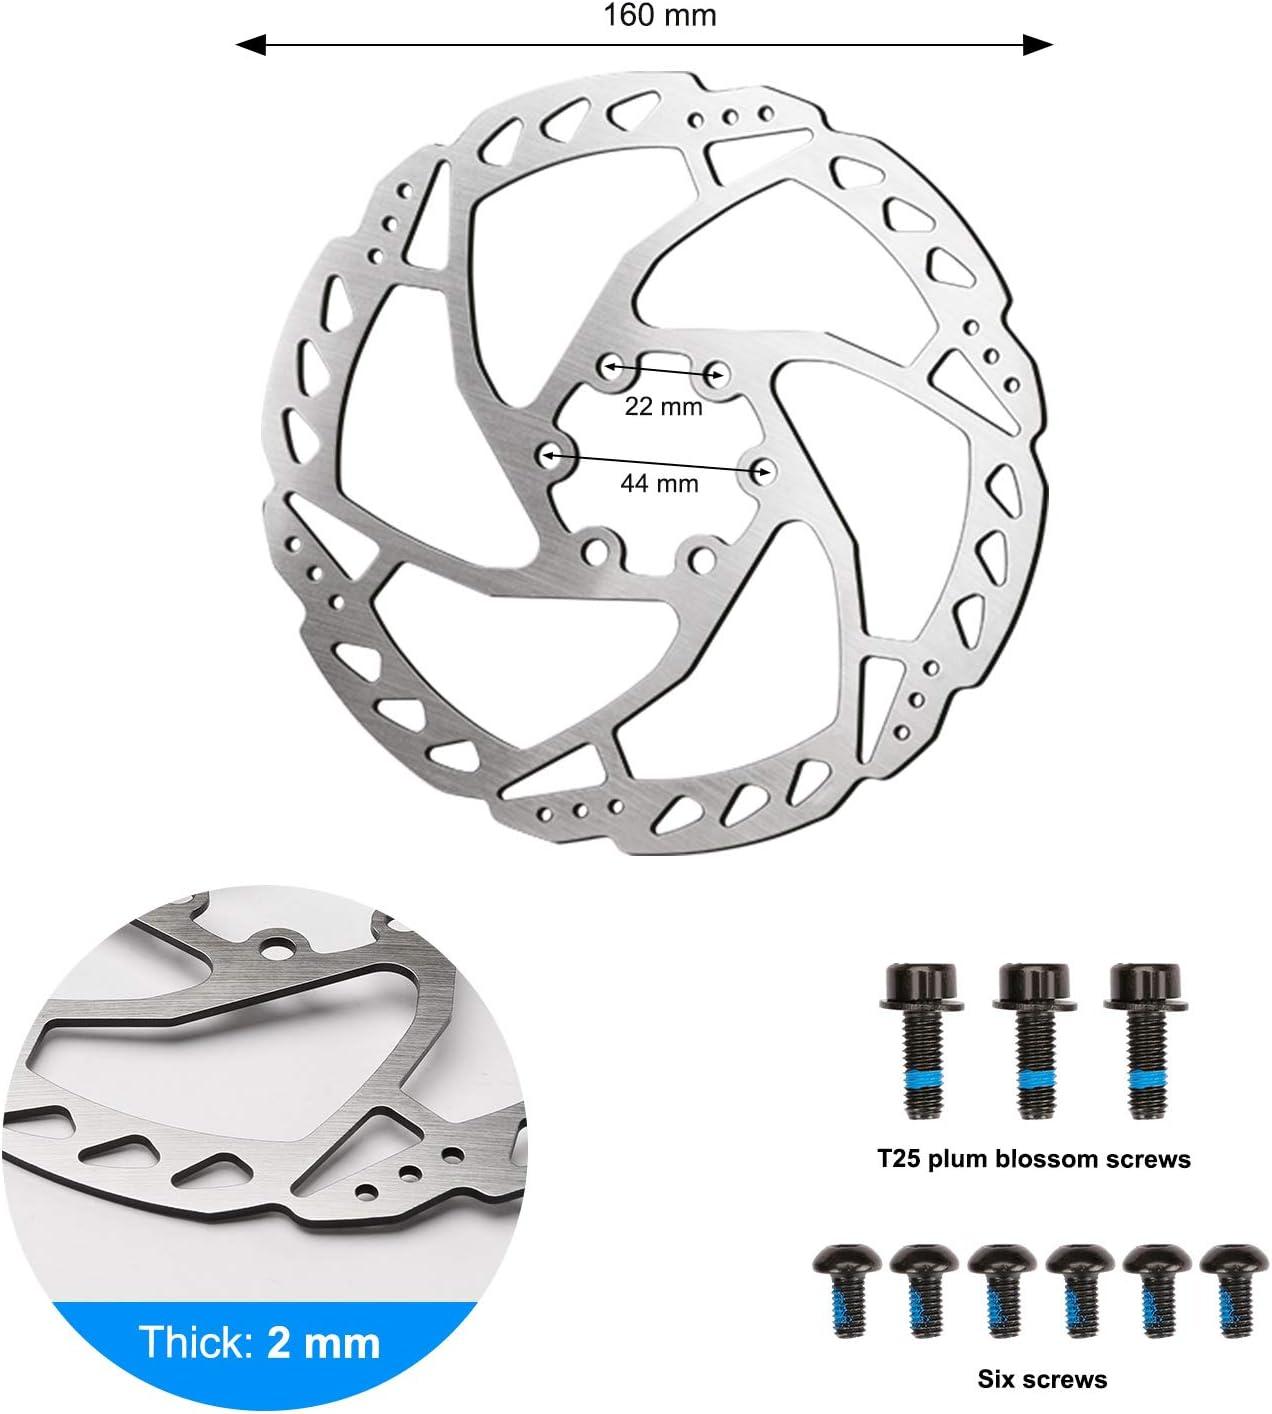 Universal Hydraulic Mechanical Disc Brake for Mountain Bike Folding Bicycle Germerse 2pcs Aluminium Alloy Cycling Disc Brake